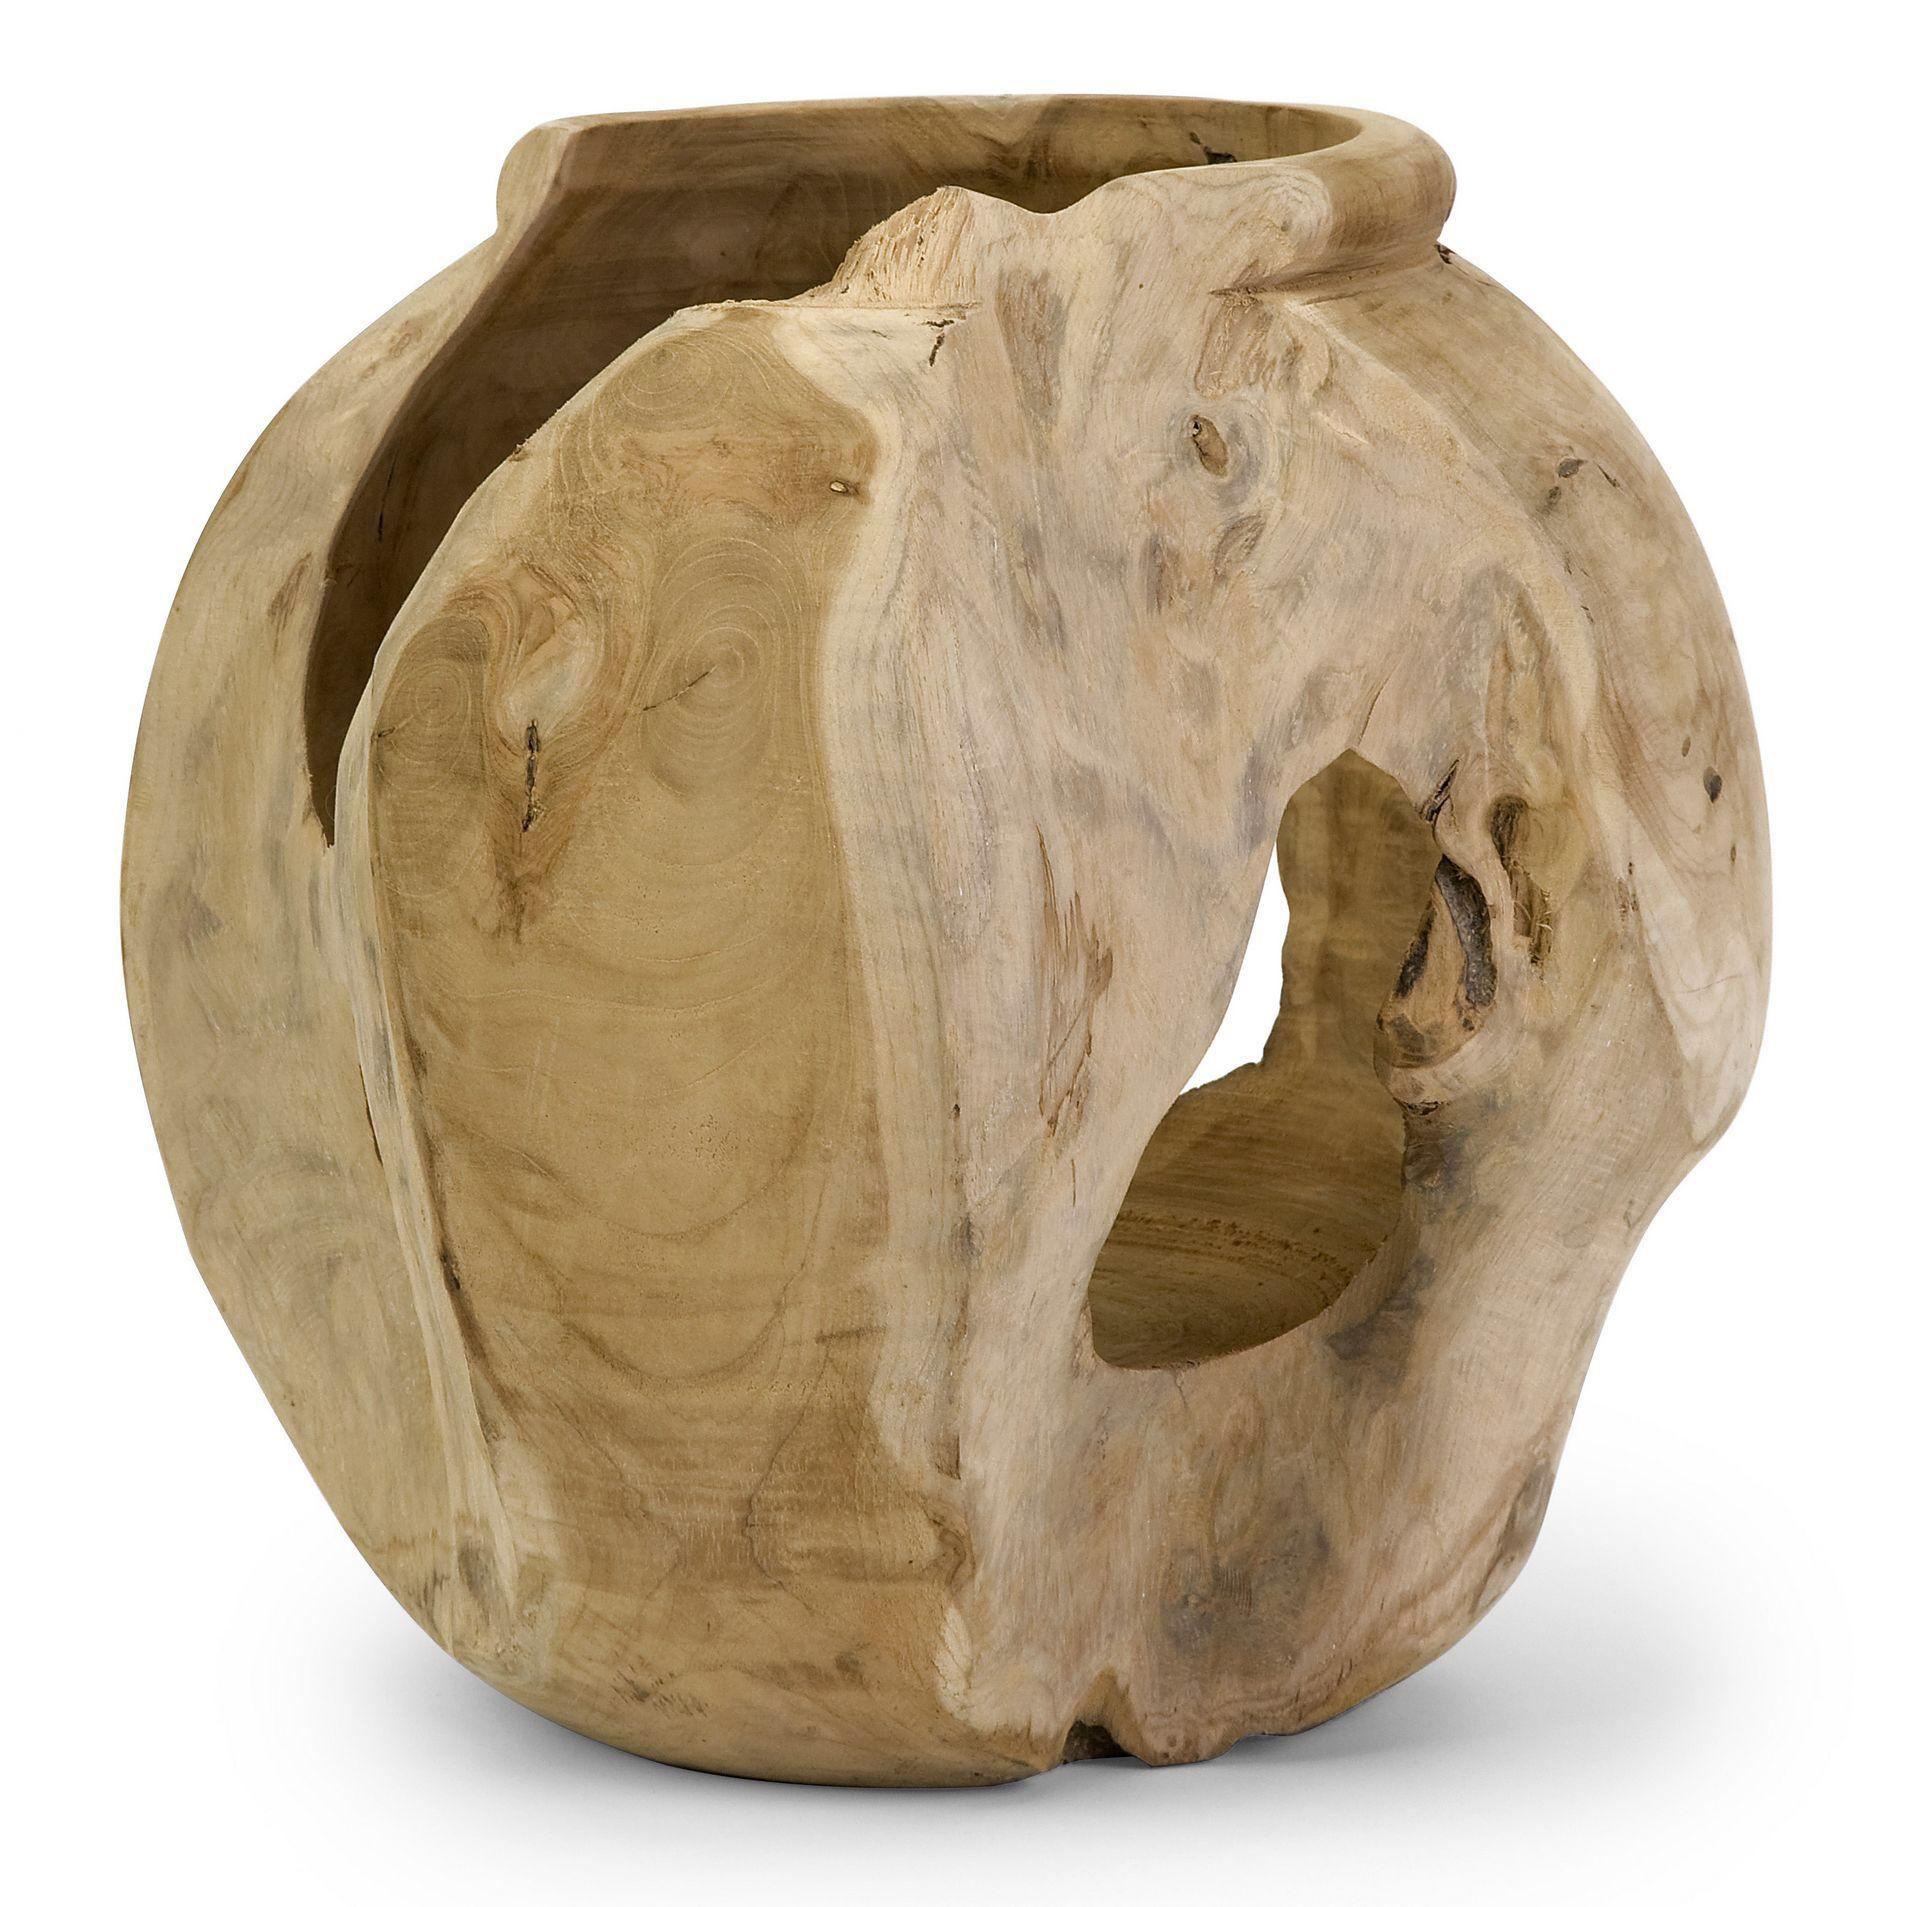 Macaque vase decor pinterest contemporary vases macaque vase floridaeventfo Image collections